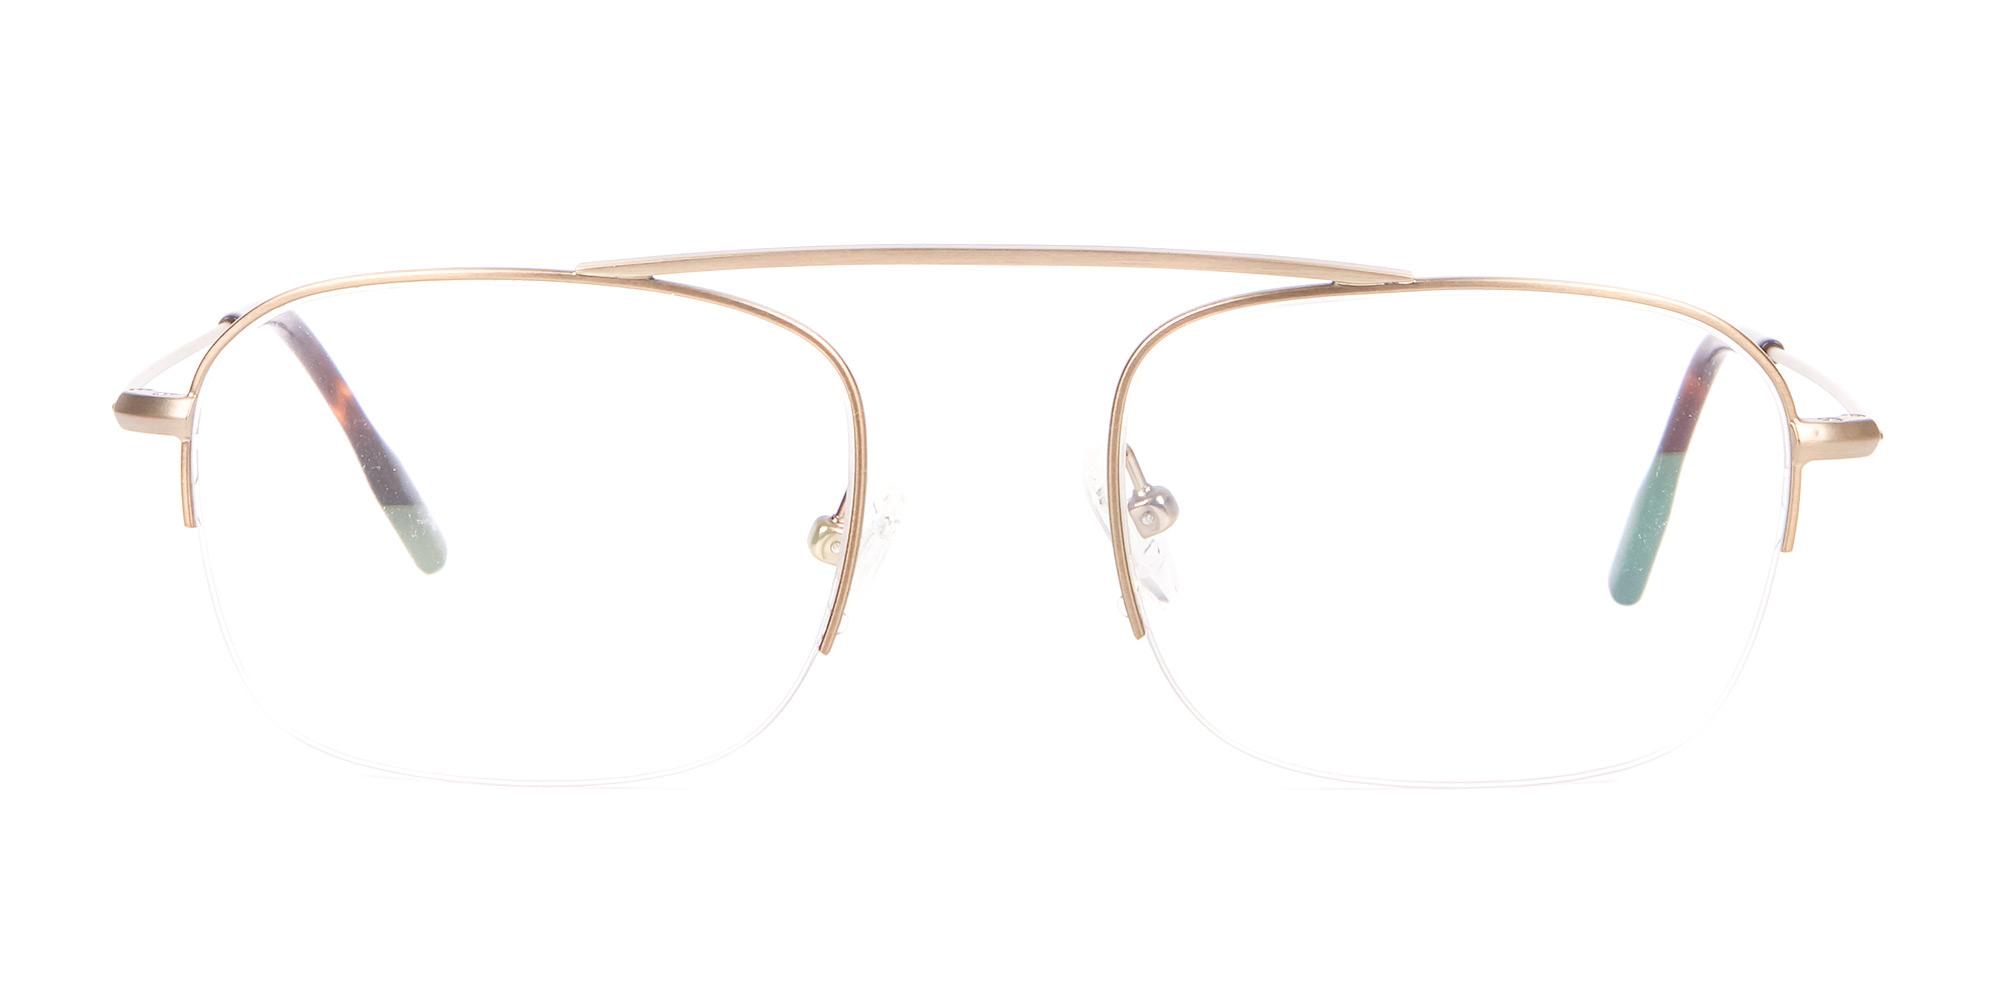 Gold Metal Half-Rimmed Glasses for triangle face shape